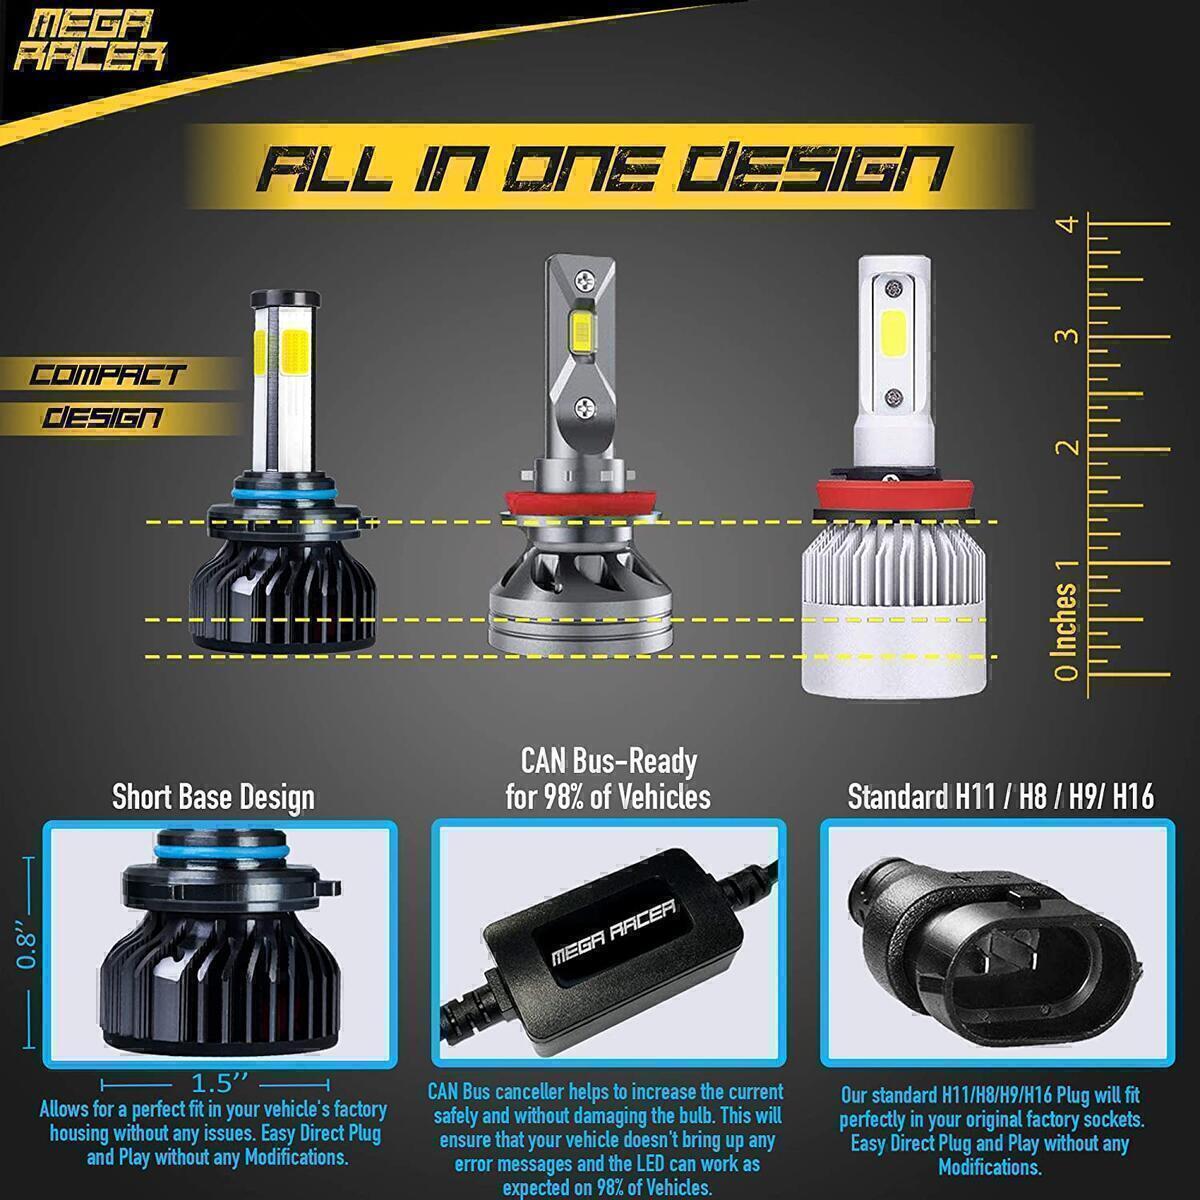 Mega Racer 4 Sided 9006/HB4 LED Headlight Bulb - Low Beam or Fog Light 60 Watt 6000K Diamond White 10000 LM COB IP68 Waterproof Rating, 2 Pieces